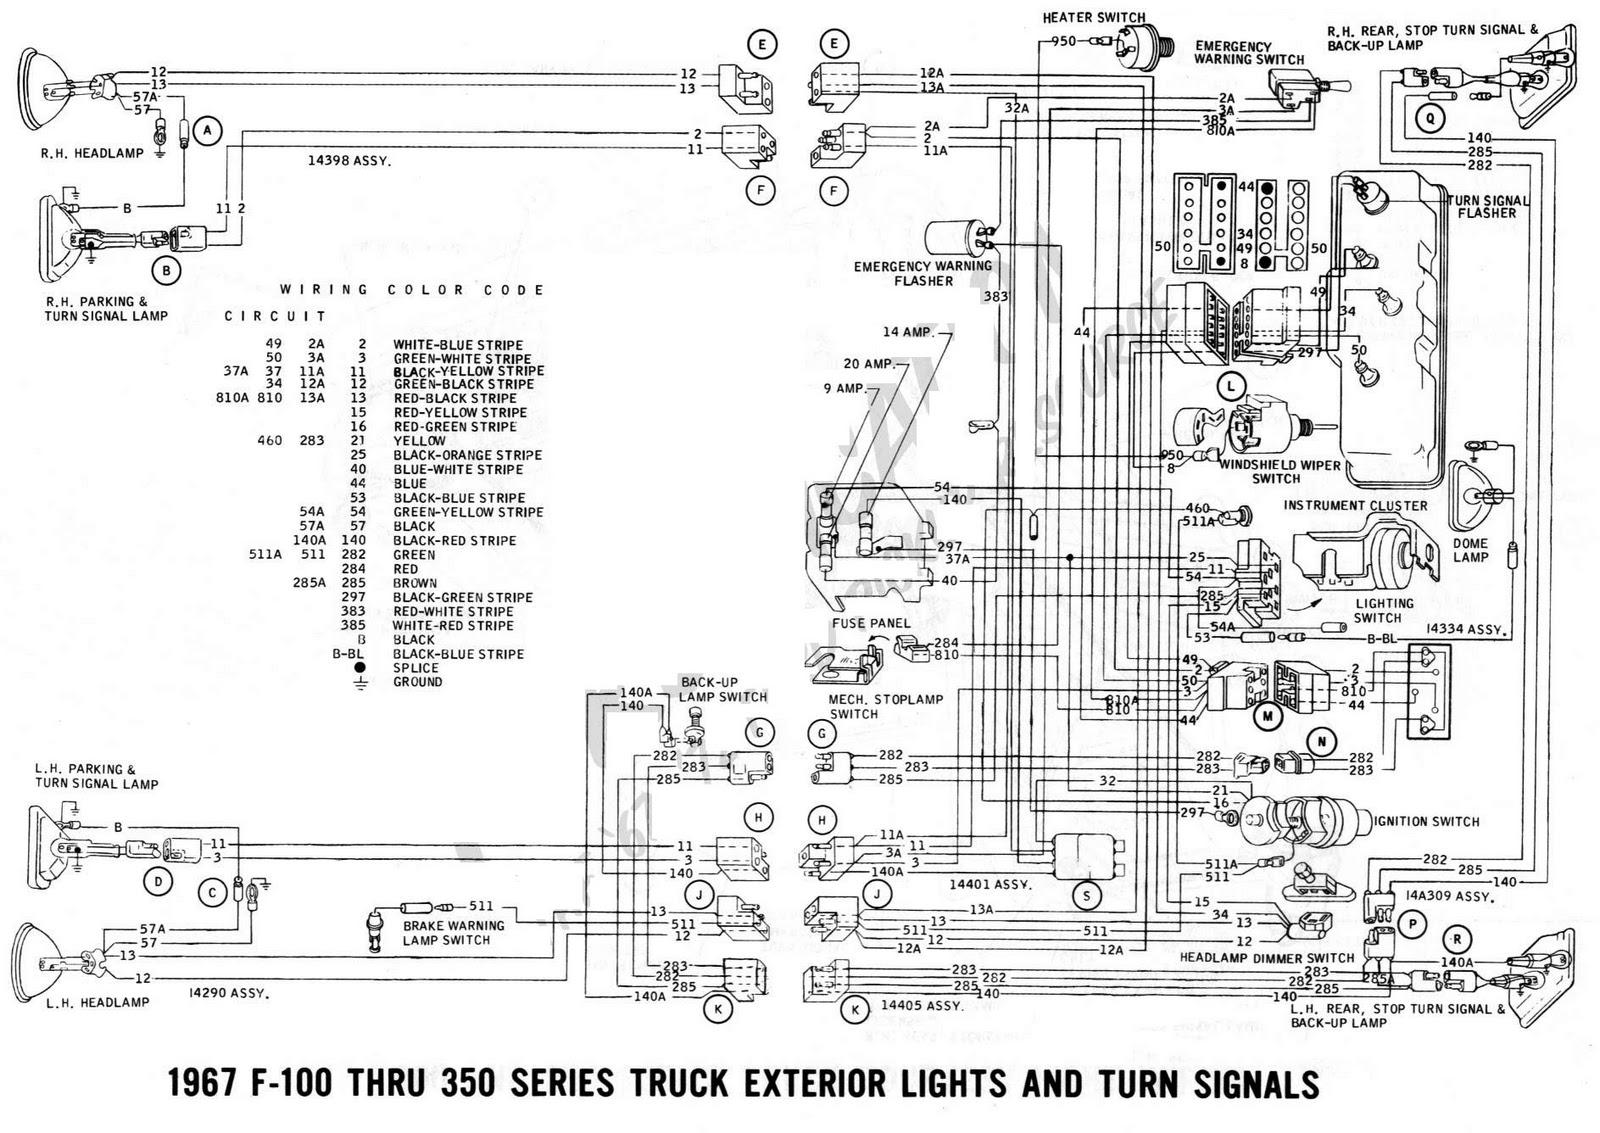 1967 Mustang Wiring And Vacuum Diagrams Average Joe Restoration ...